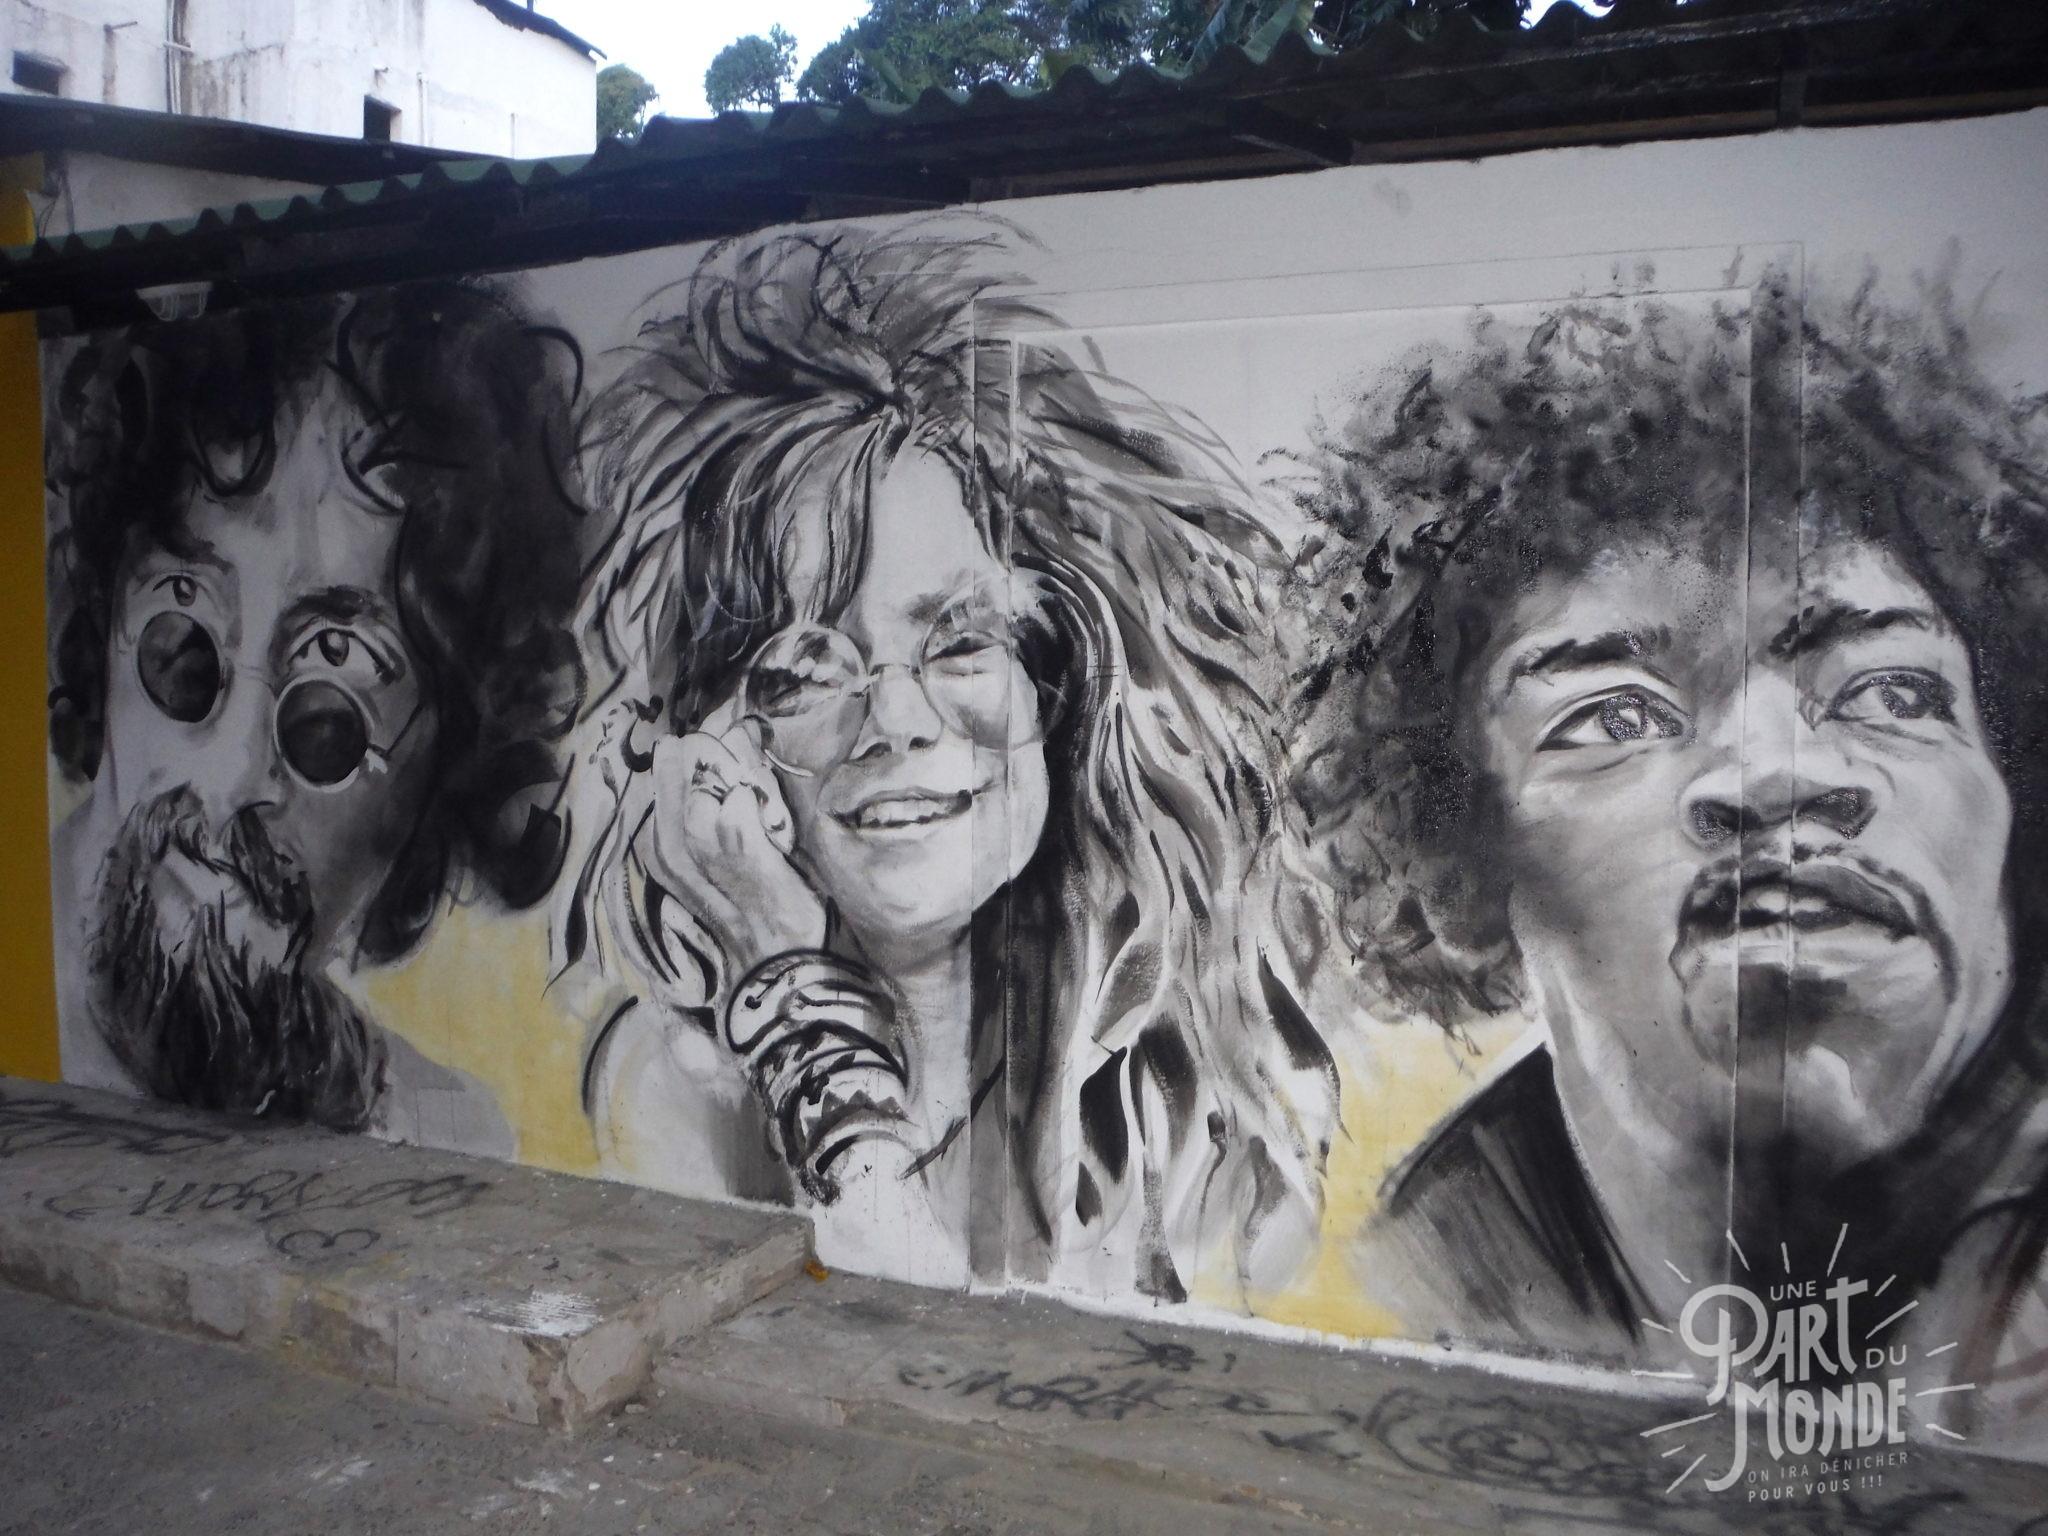 morro de sao paulo street art